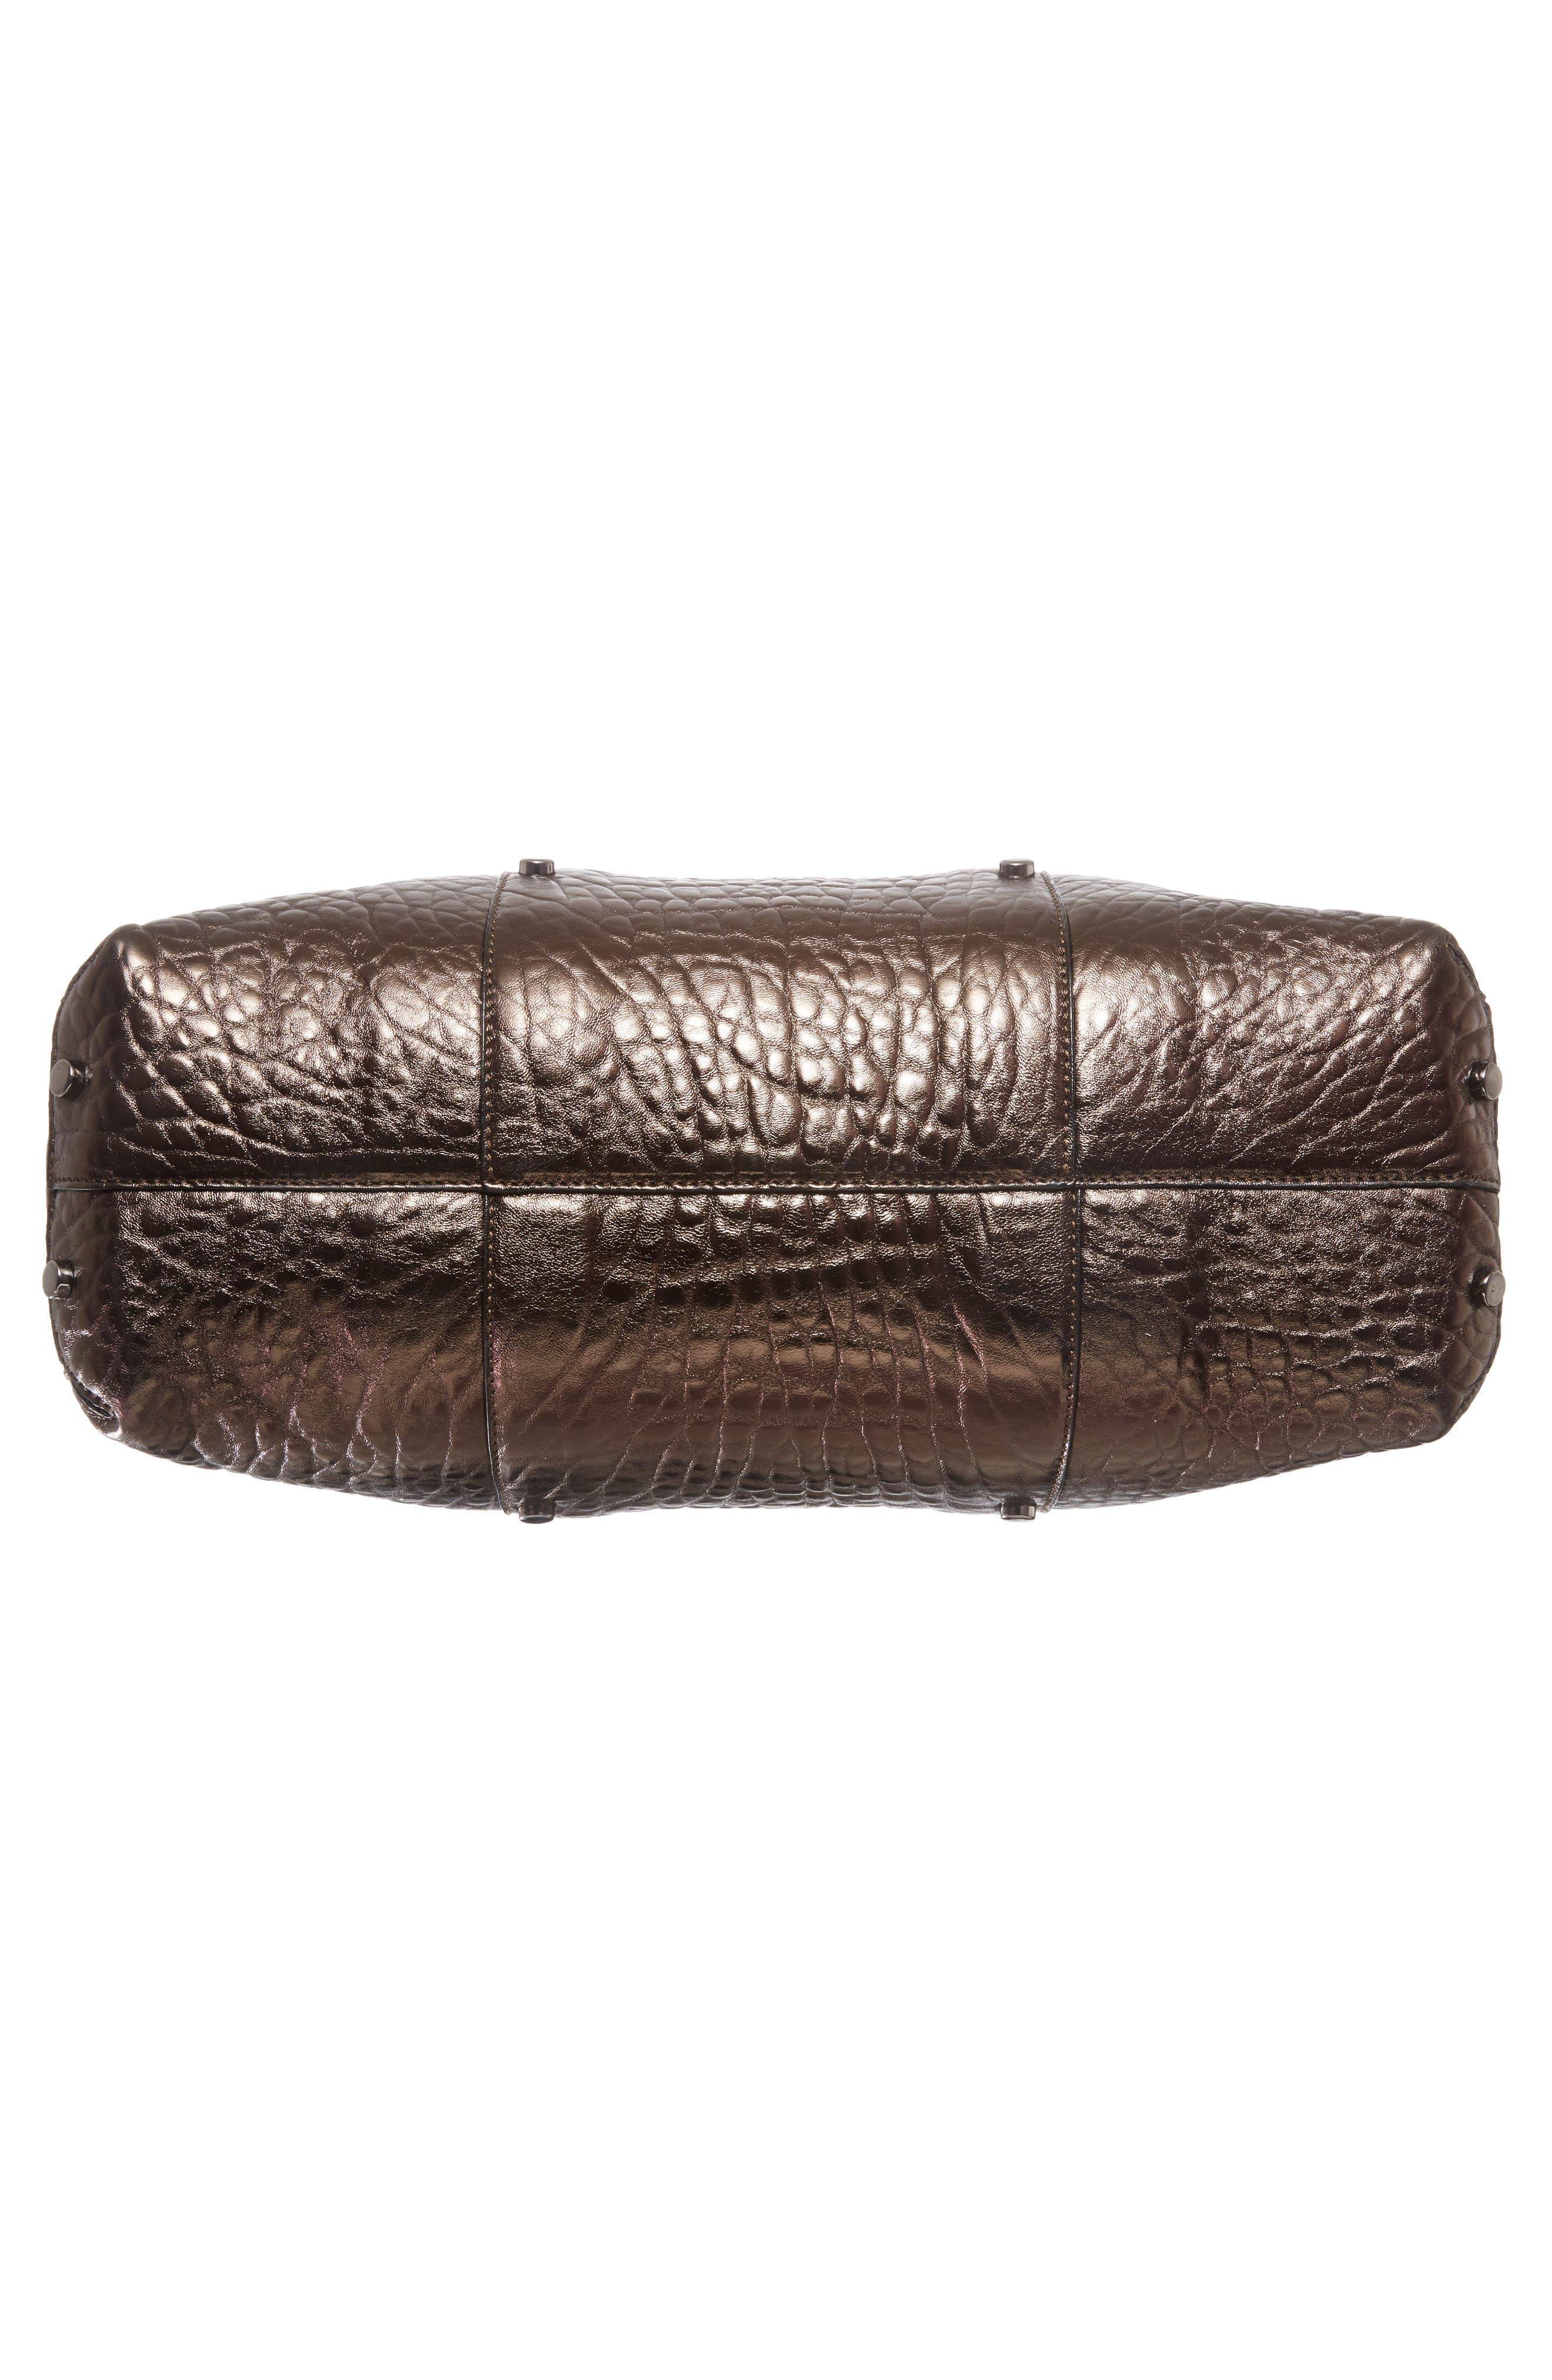 Lockett Metallic Leather Shopper,                             Alternate thumbnail 6, color,                             200